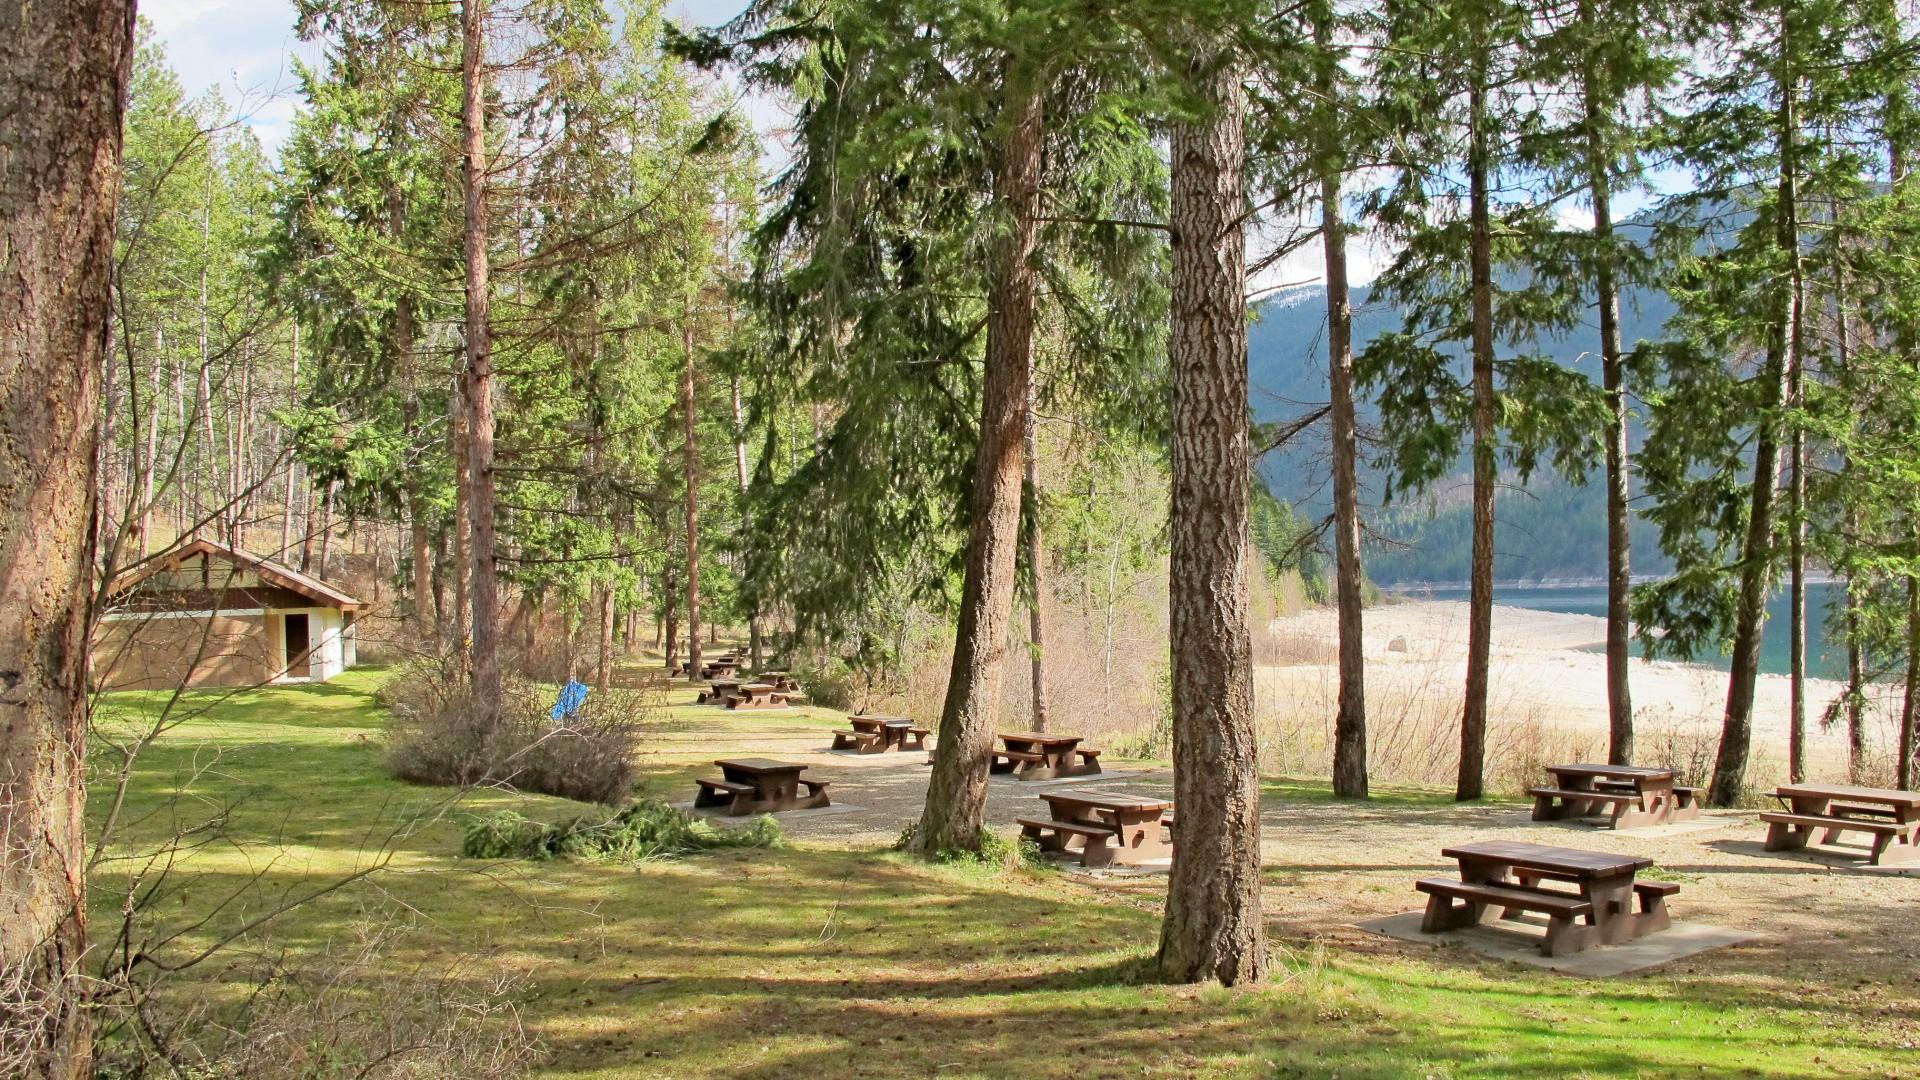 Syringa Provincial Park - Castlegar, BC - Campgrounds on ...